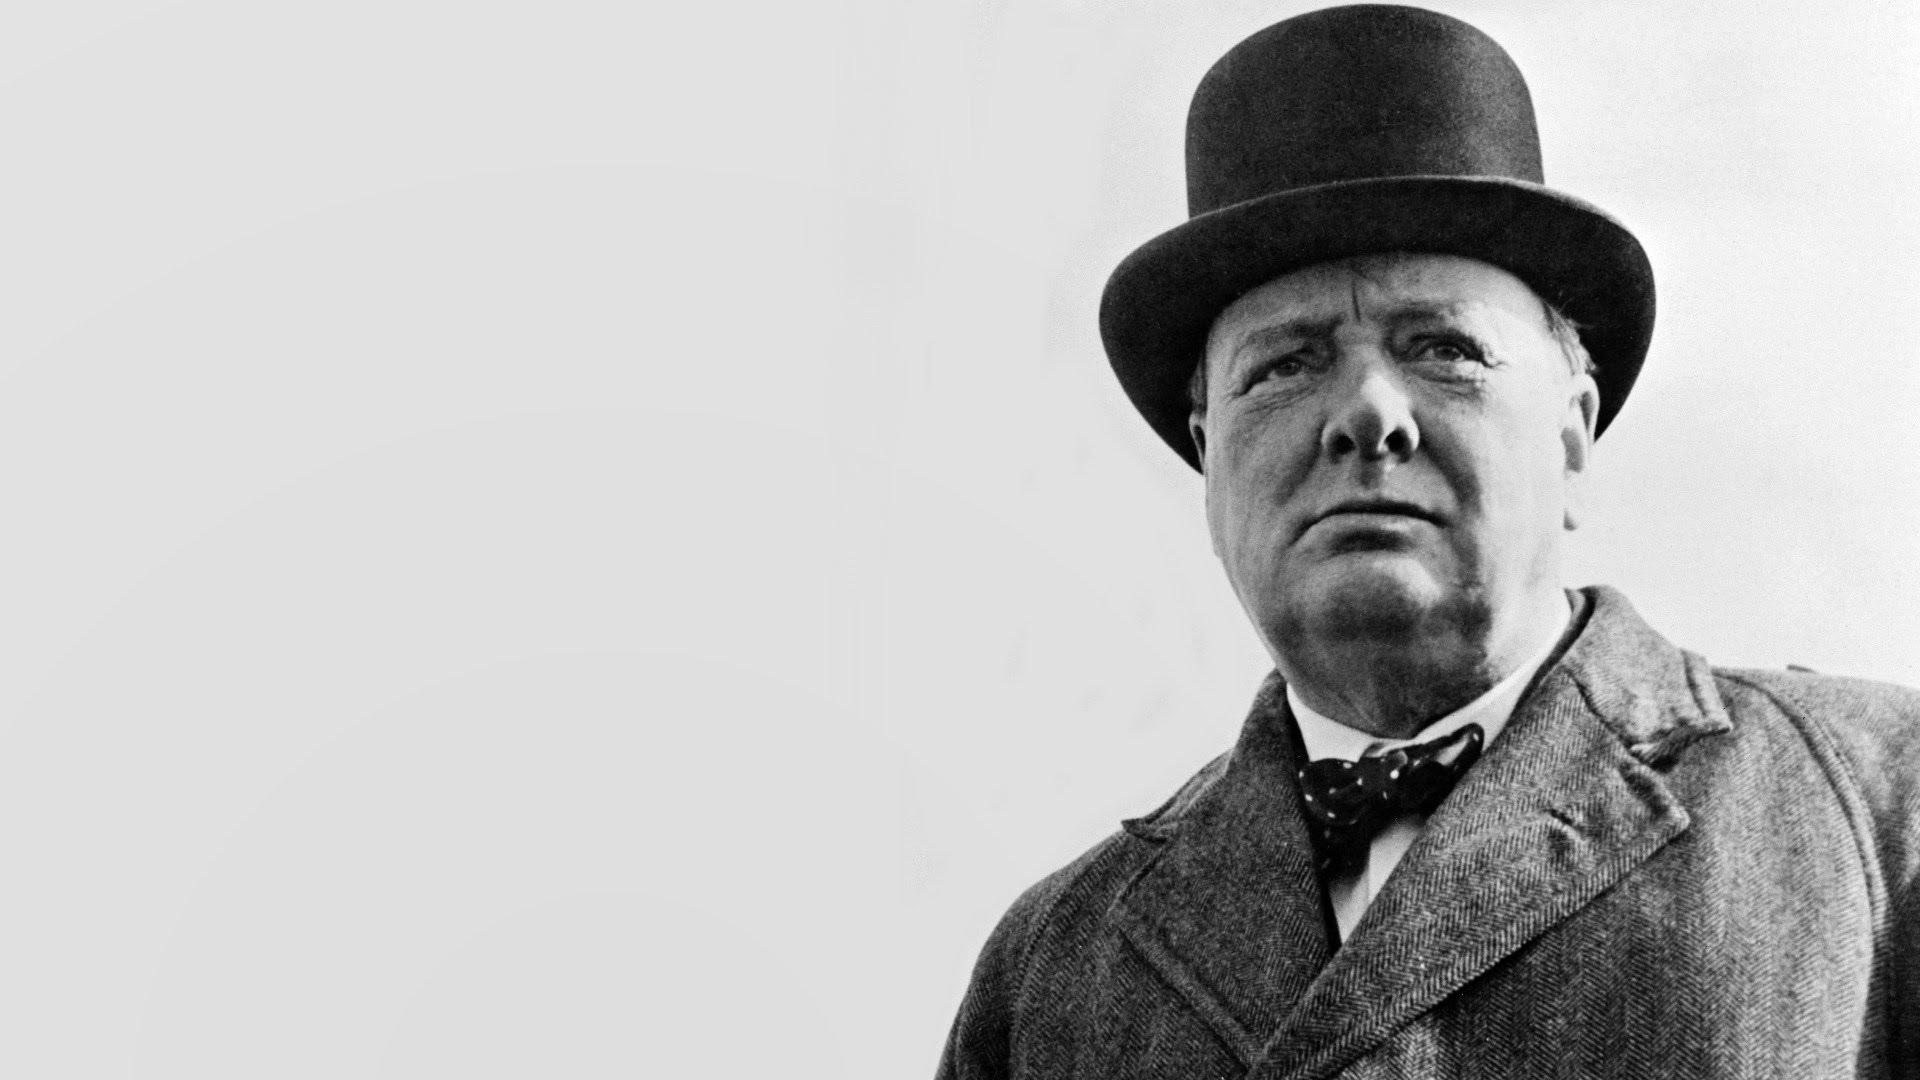 1920x1080 > Winston Churchill Wallpapers